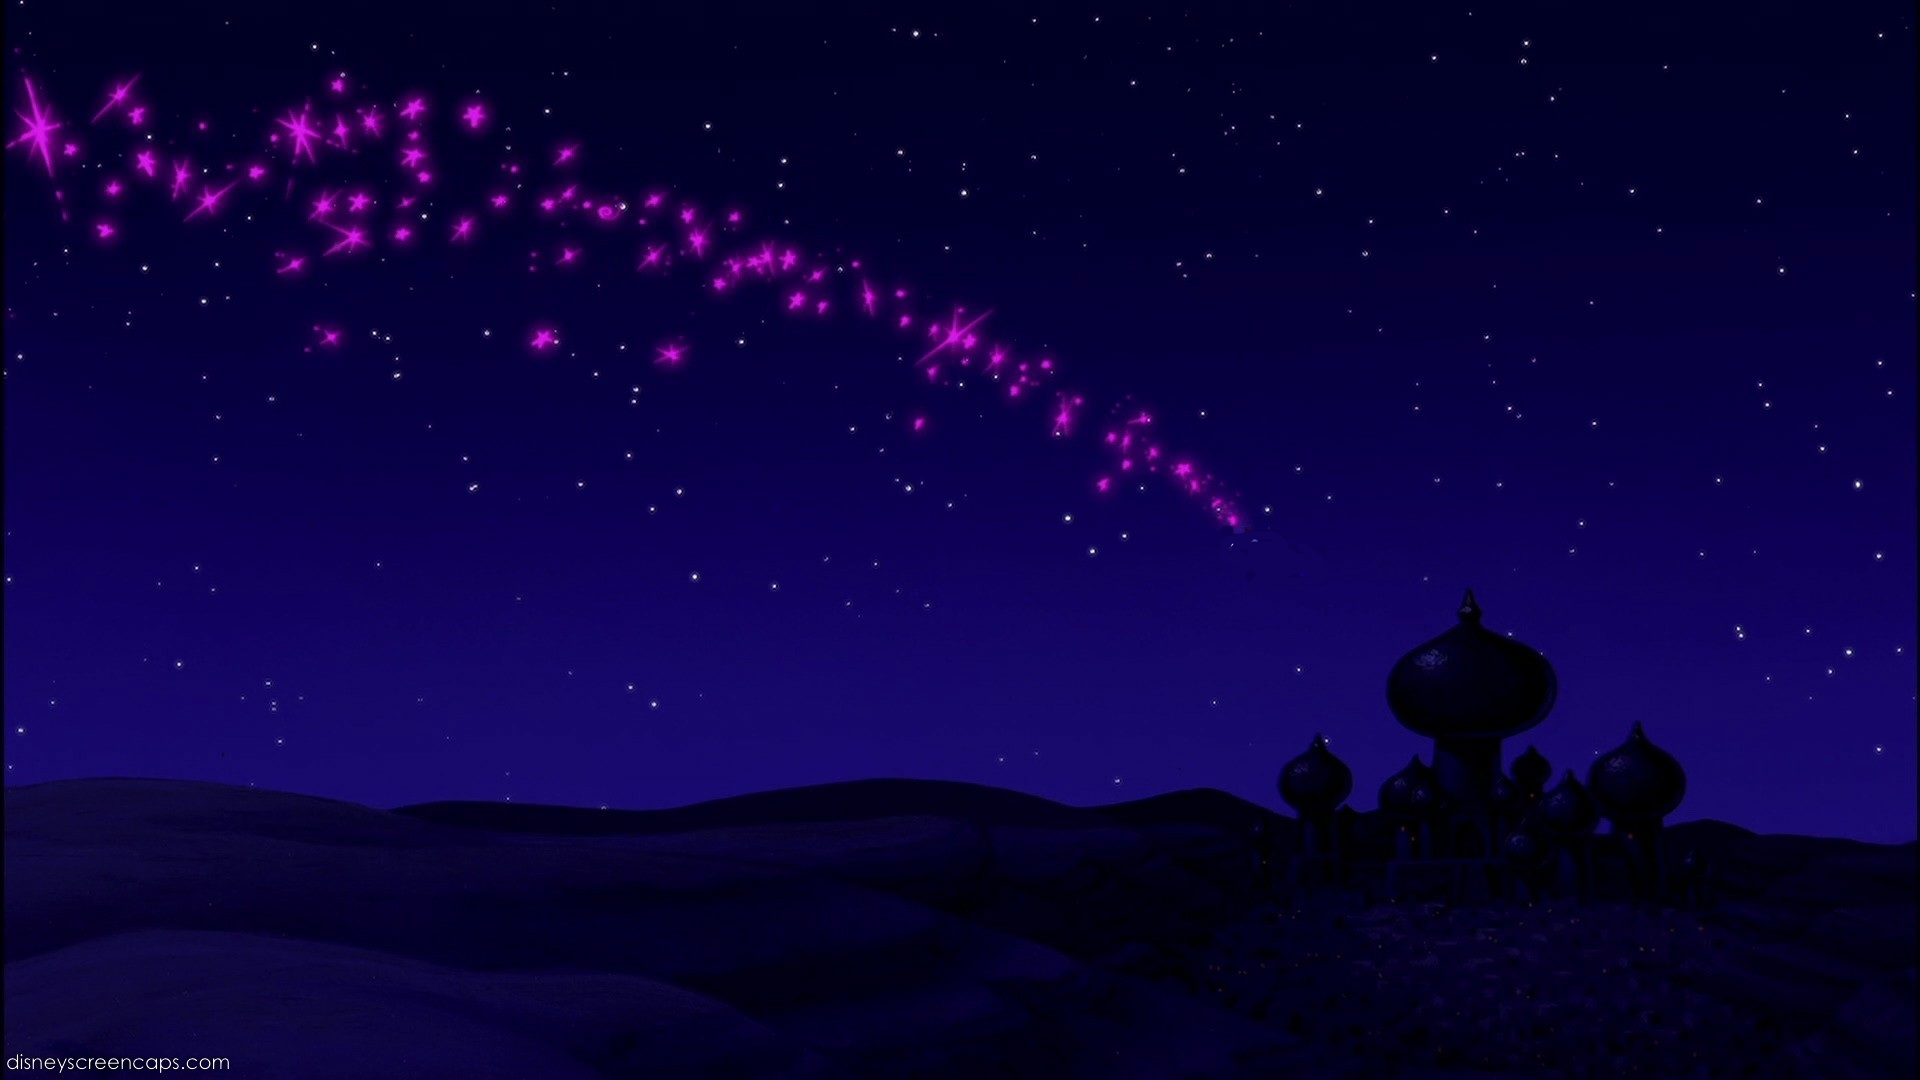 Empty Backdrop from Aladdin